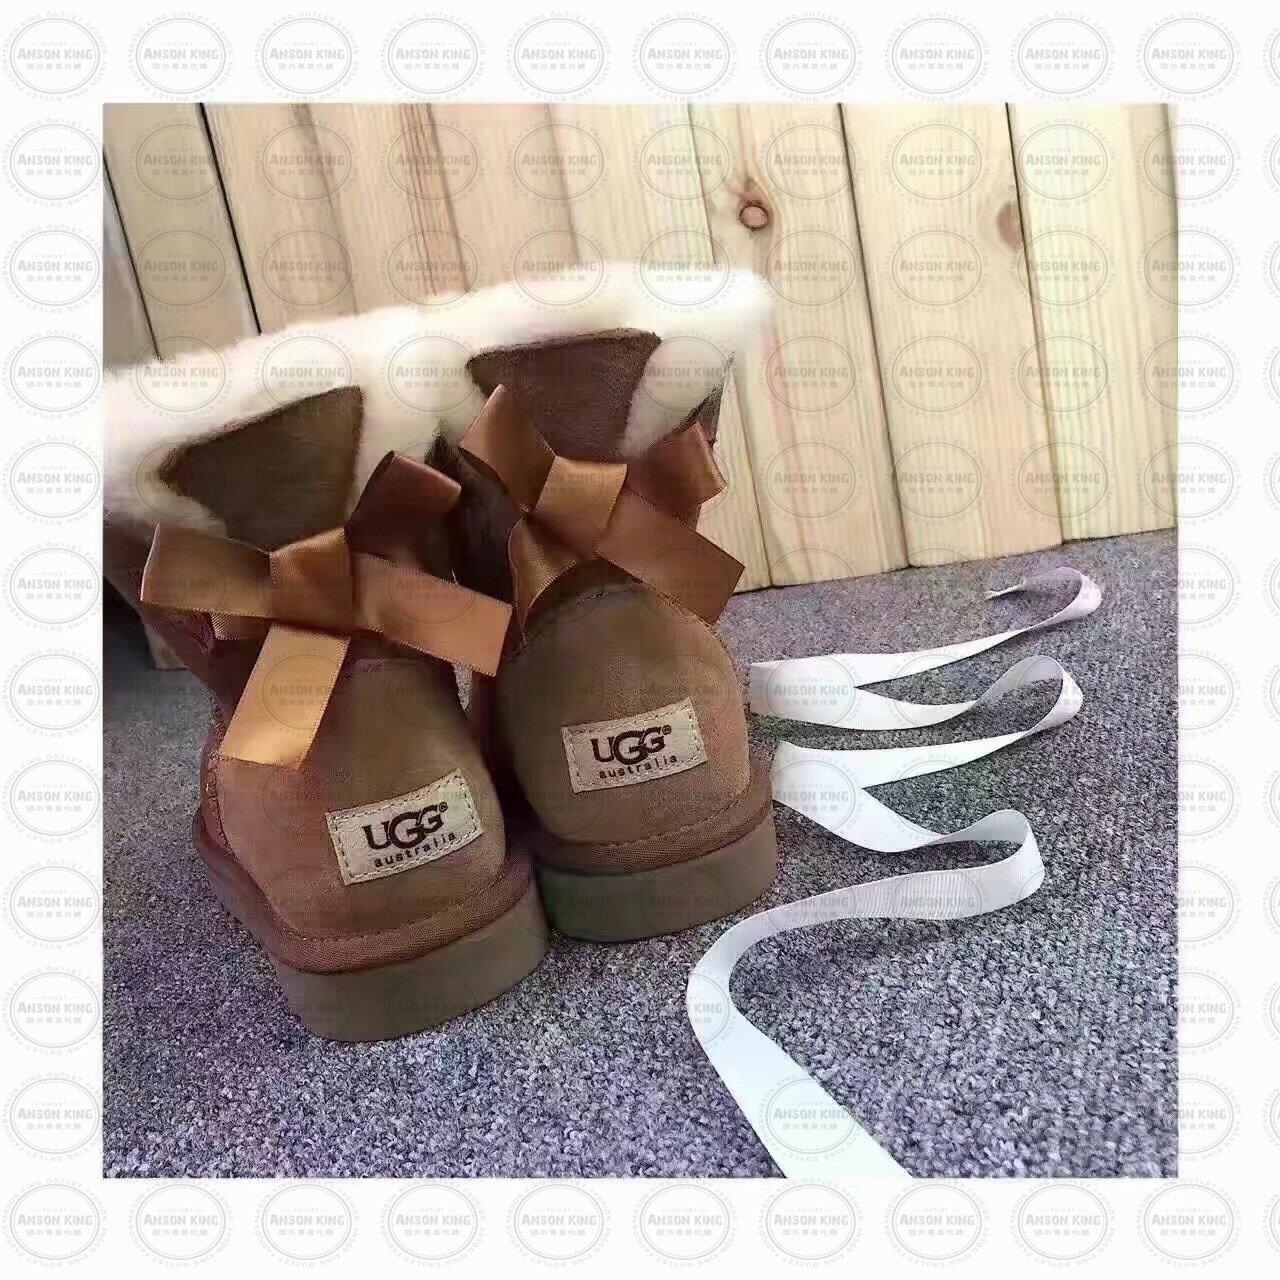 OUTLET正品代購 澳洲 UGG 單蝴蝶結羊皮毛一體 中長靴 保暖 真皮羊皮毛 雪靴 短靴 駝色 0